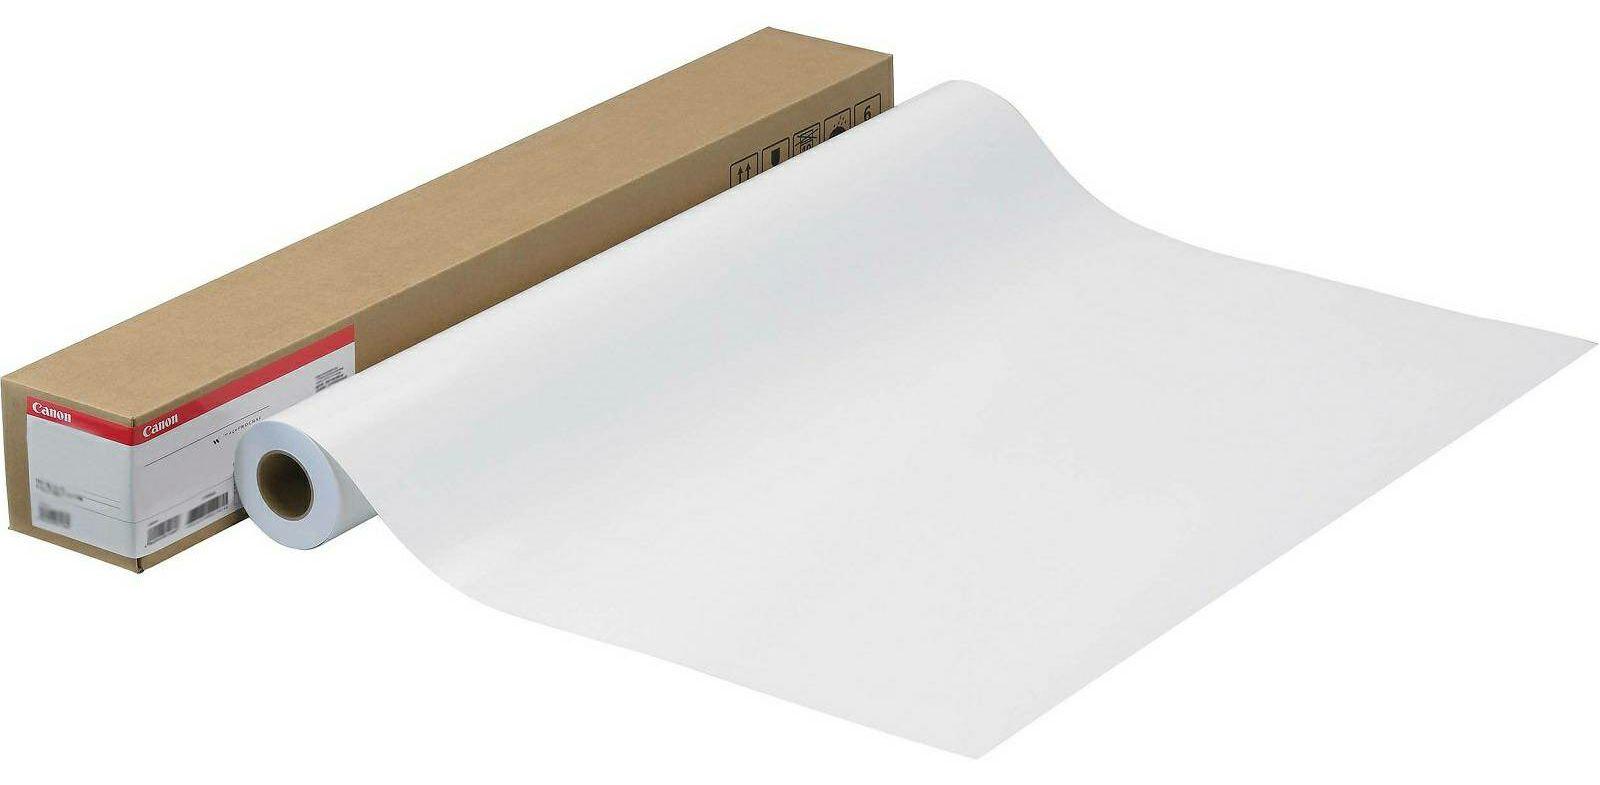 Canon Matt Coated Paper 140gsm 17